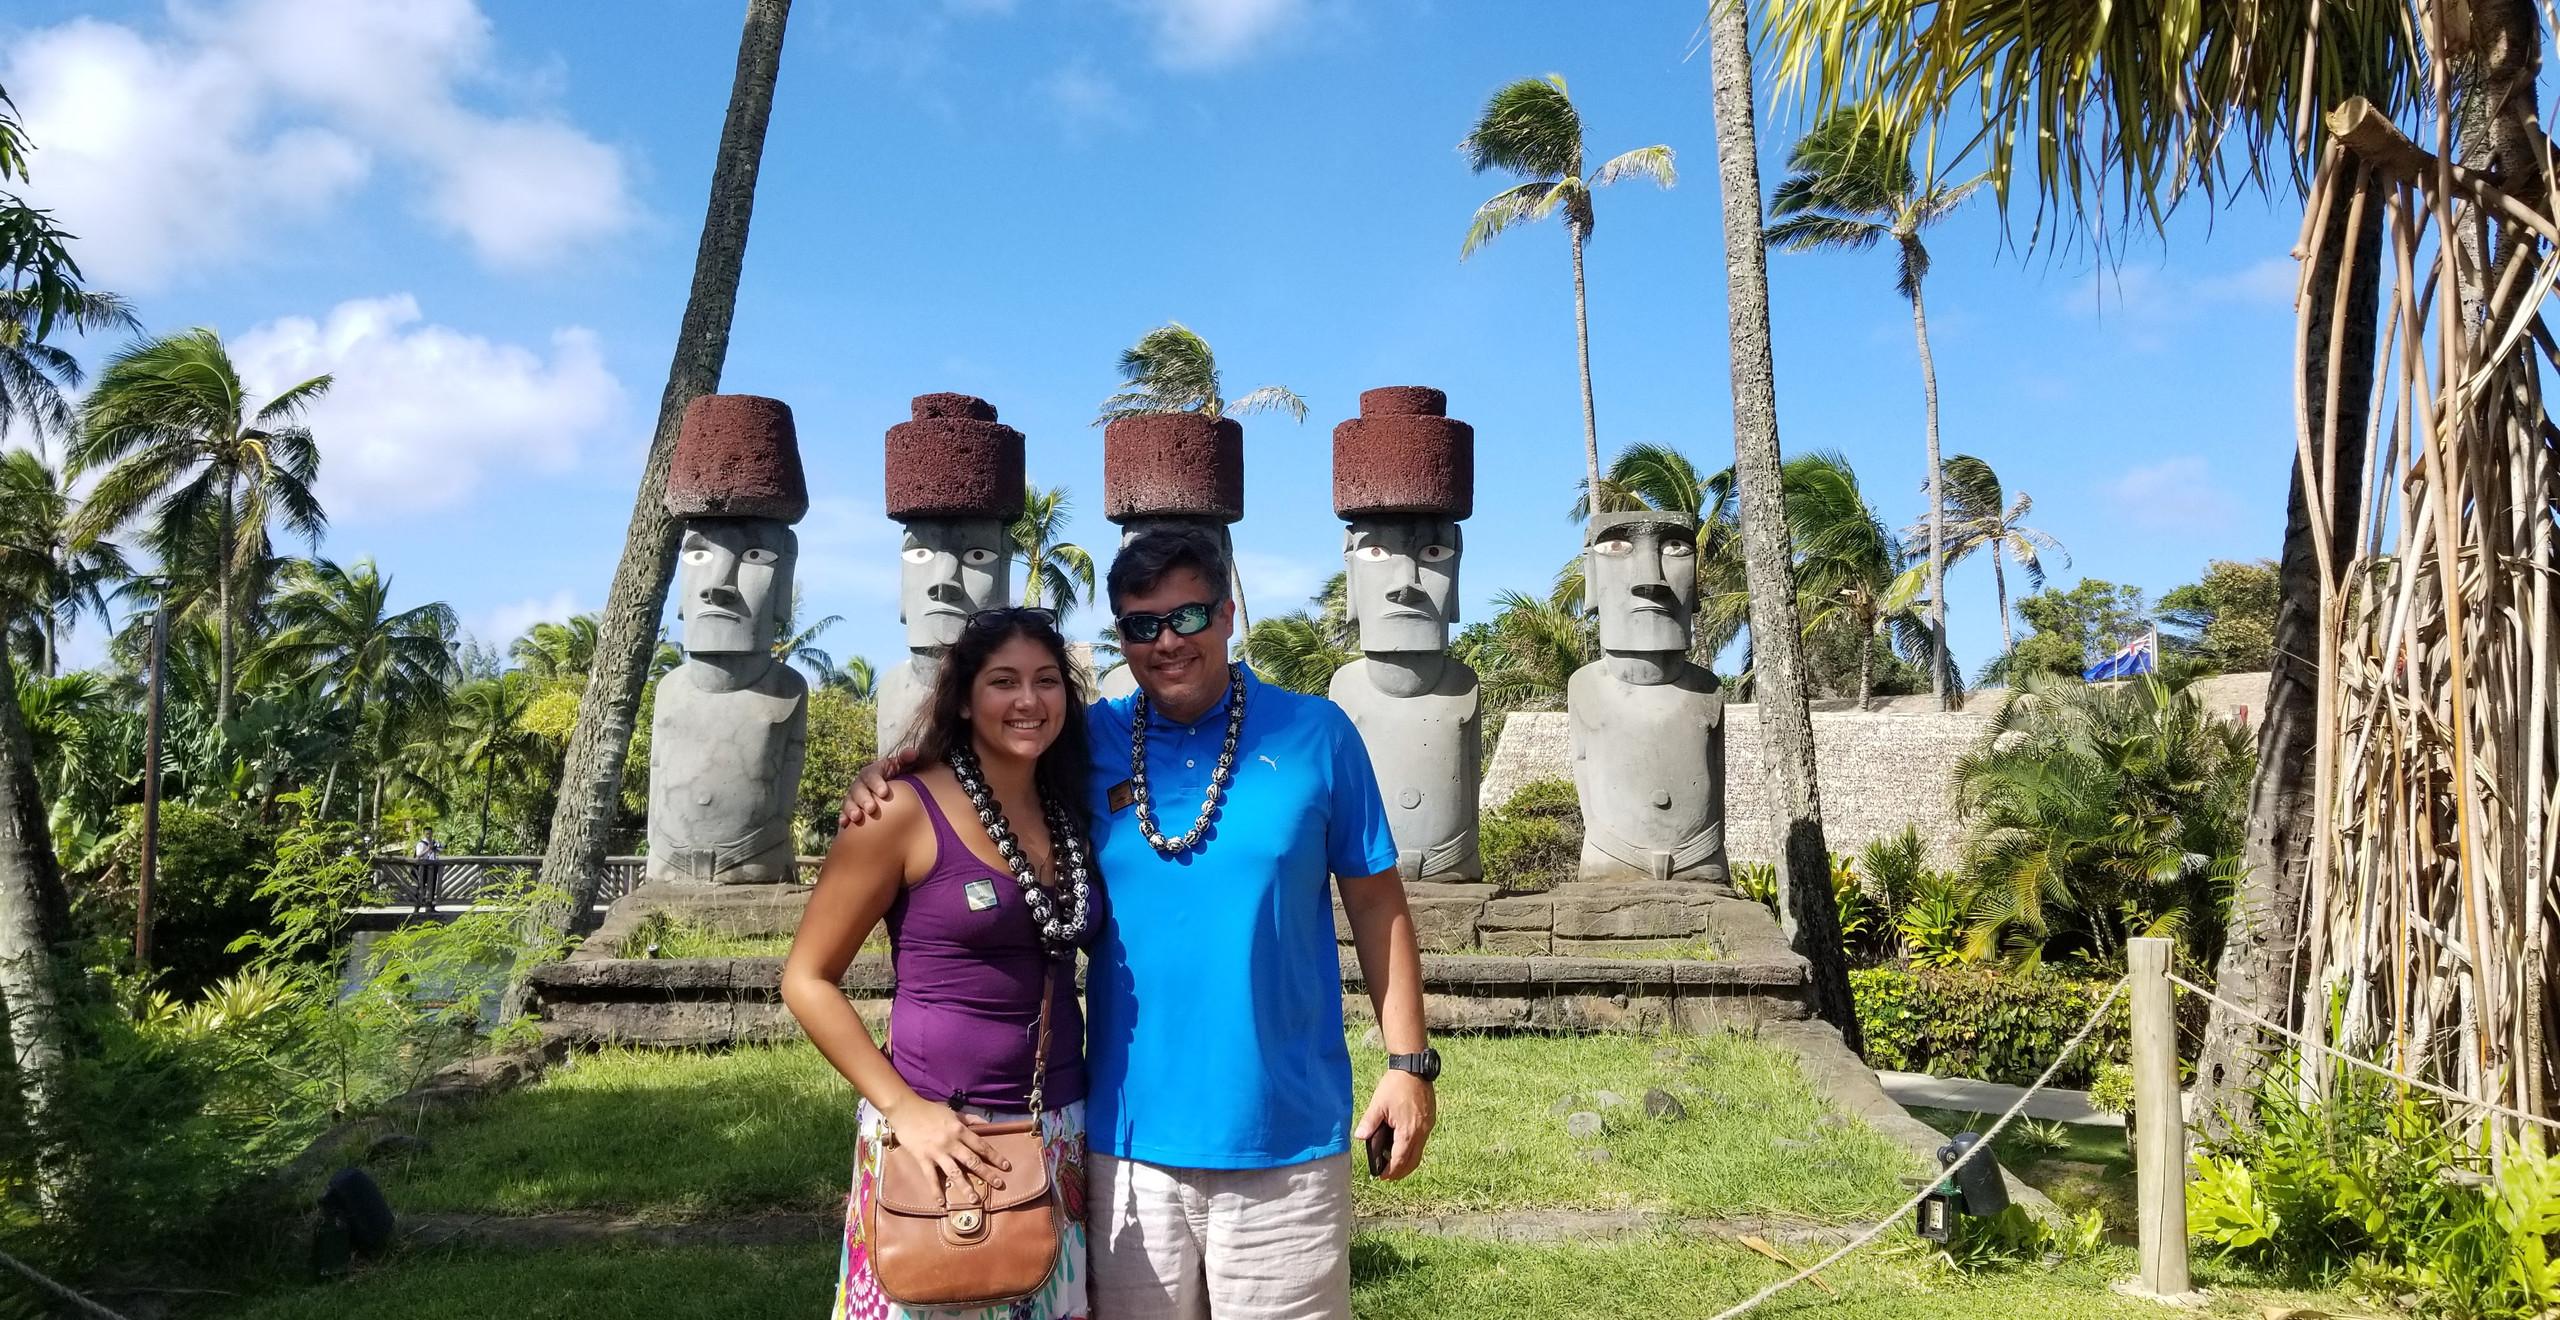 polynesian cultural center, hawaii culture, oahu hawaii, polynesian culture, byu hawaii